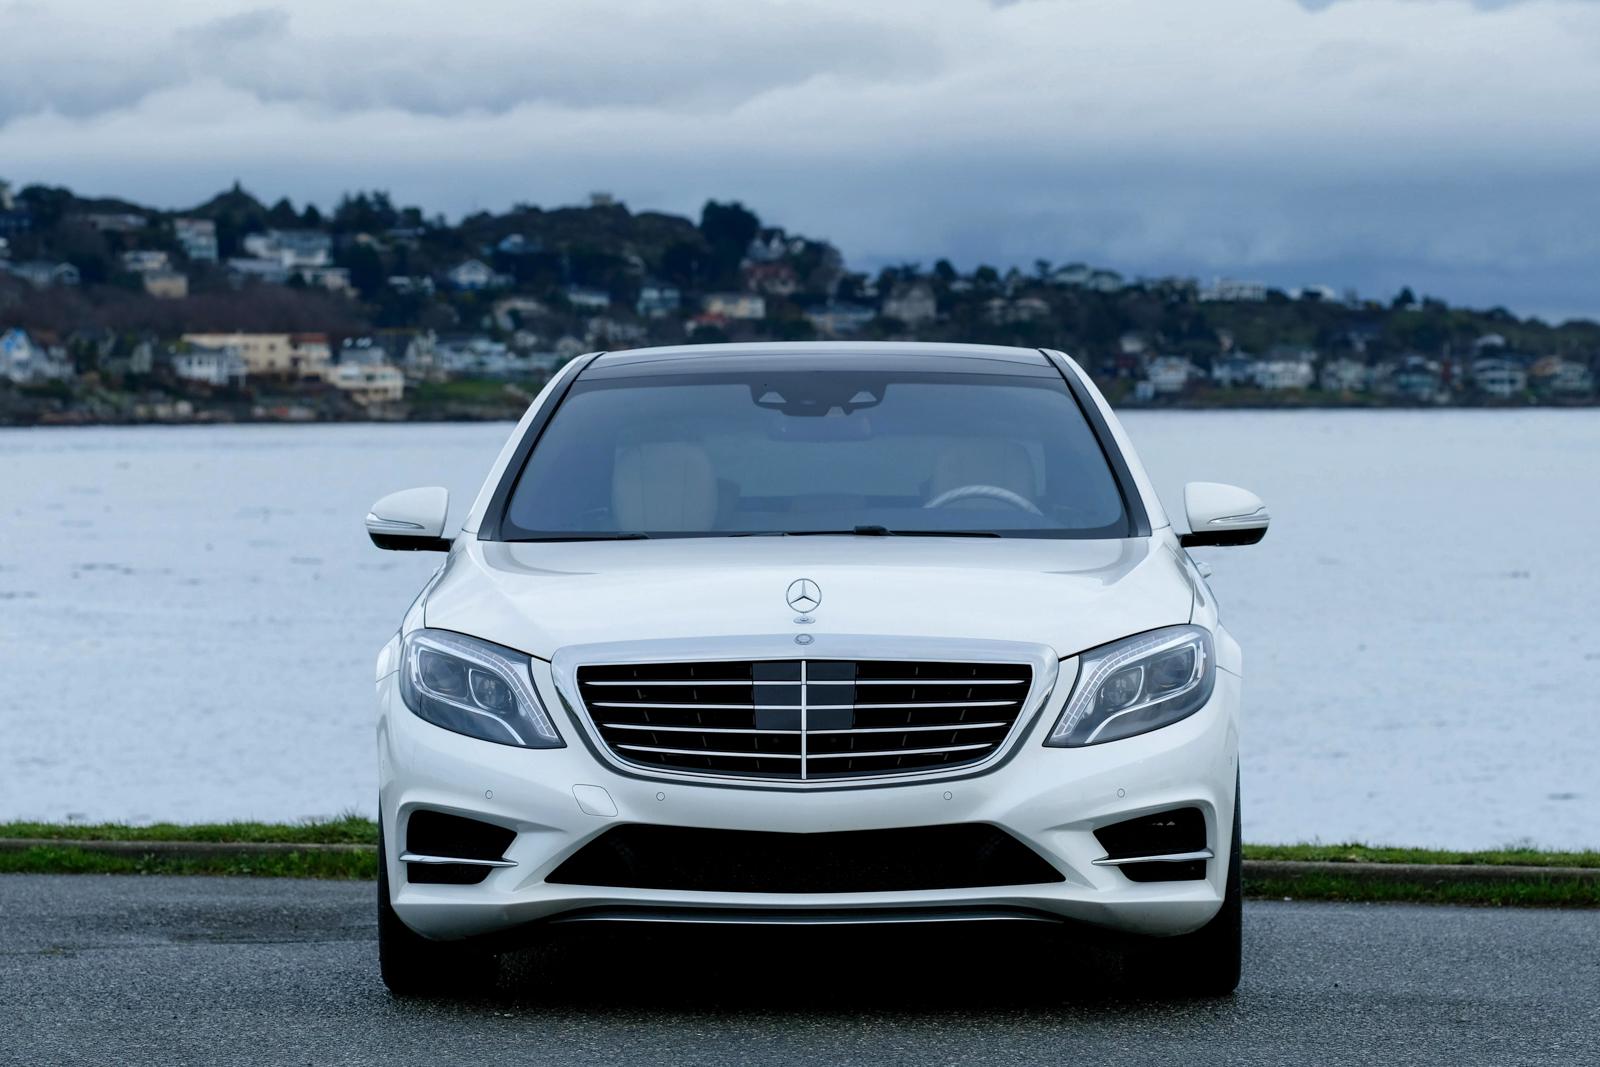 2017 mercedes benz s550 silver arrow cars ltd. Black Bedroom Furniture Sets. Home Design Ideas